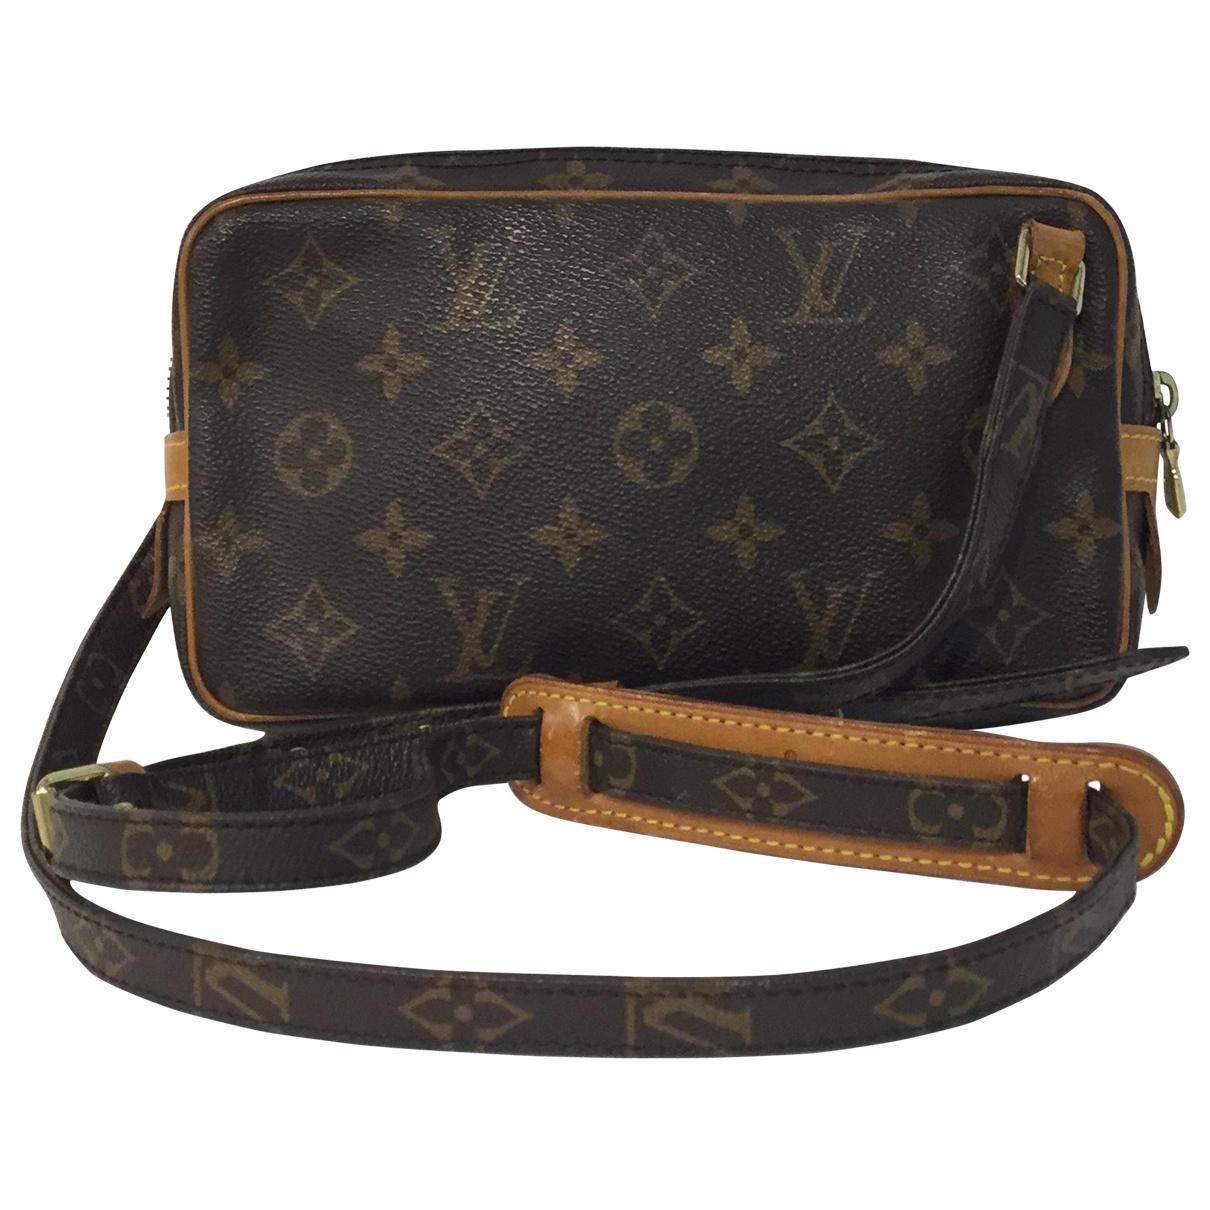 8e0275b1a243 Louis Vuitton Marly Cloth Crossbody Bag in Brown - Lyst